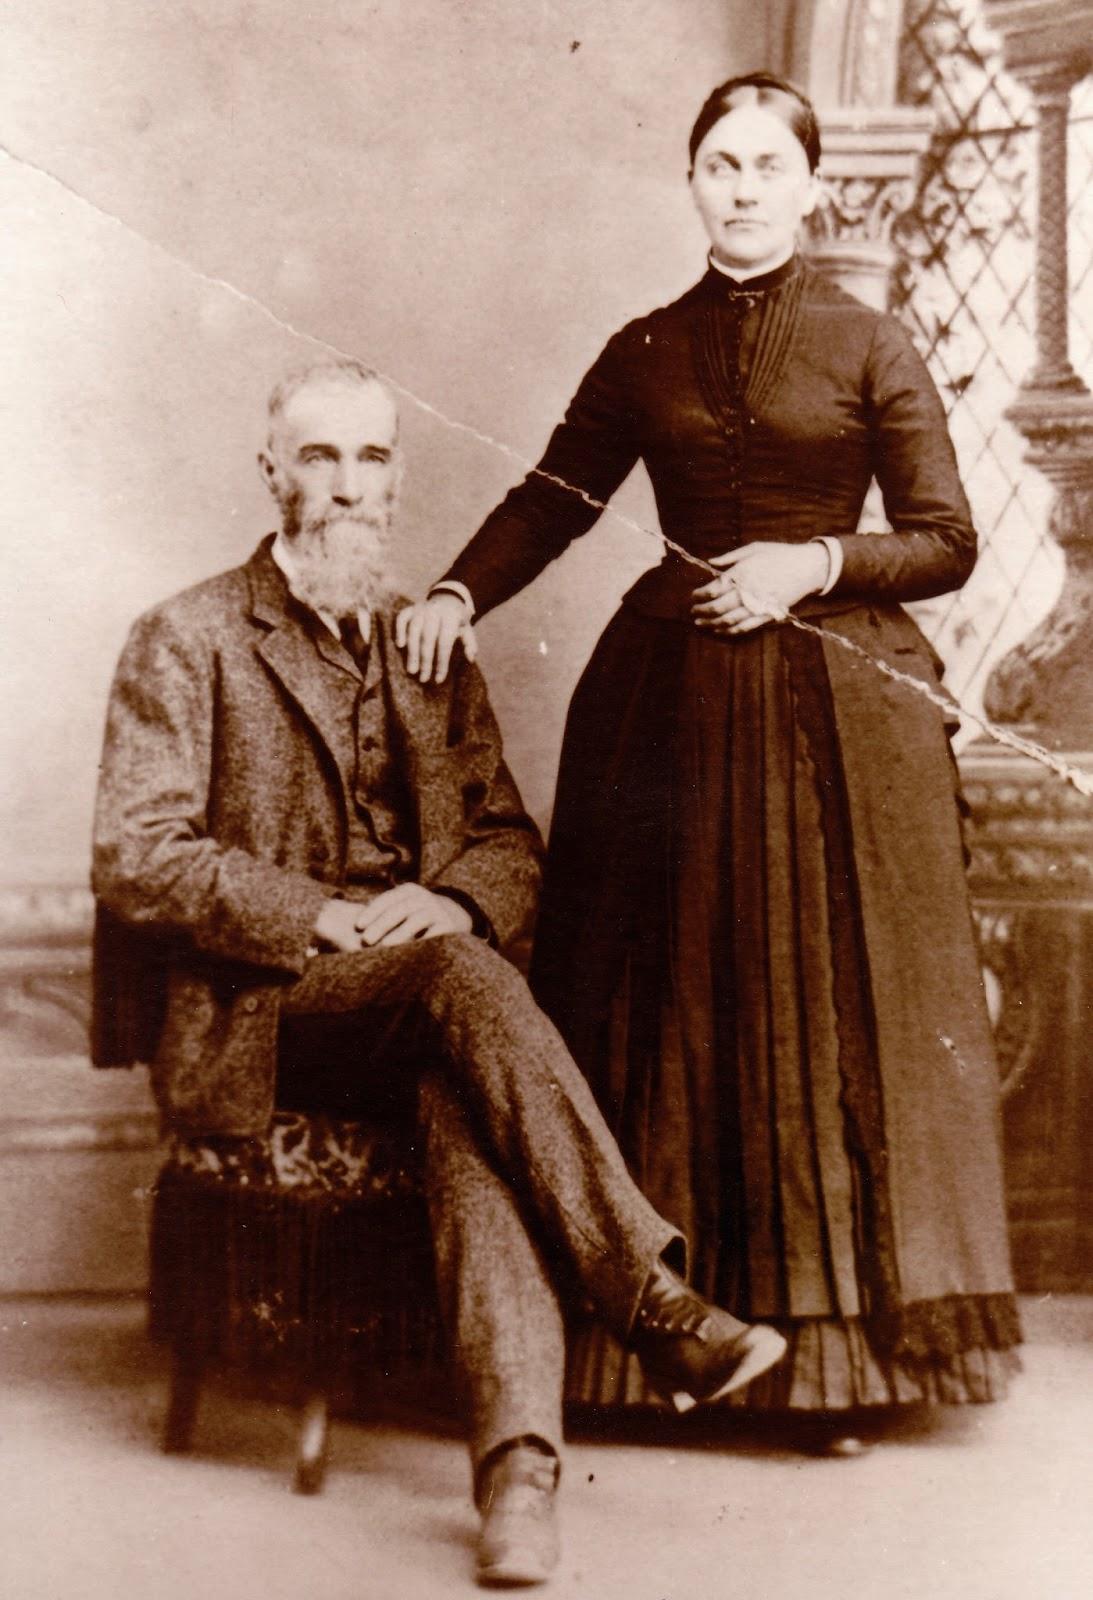 William Wilson Joseph and wife Eliza Jane Spitler, Augusta Co., VA